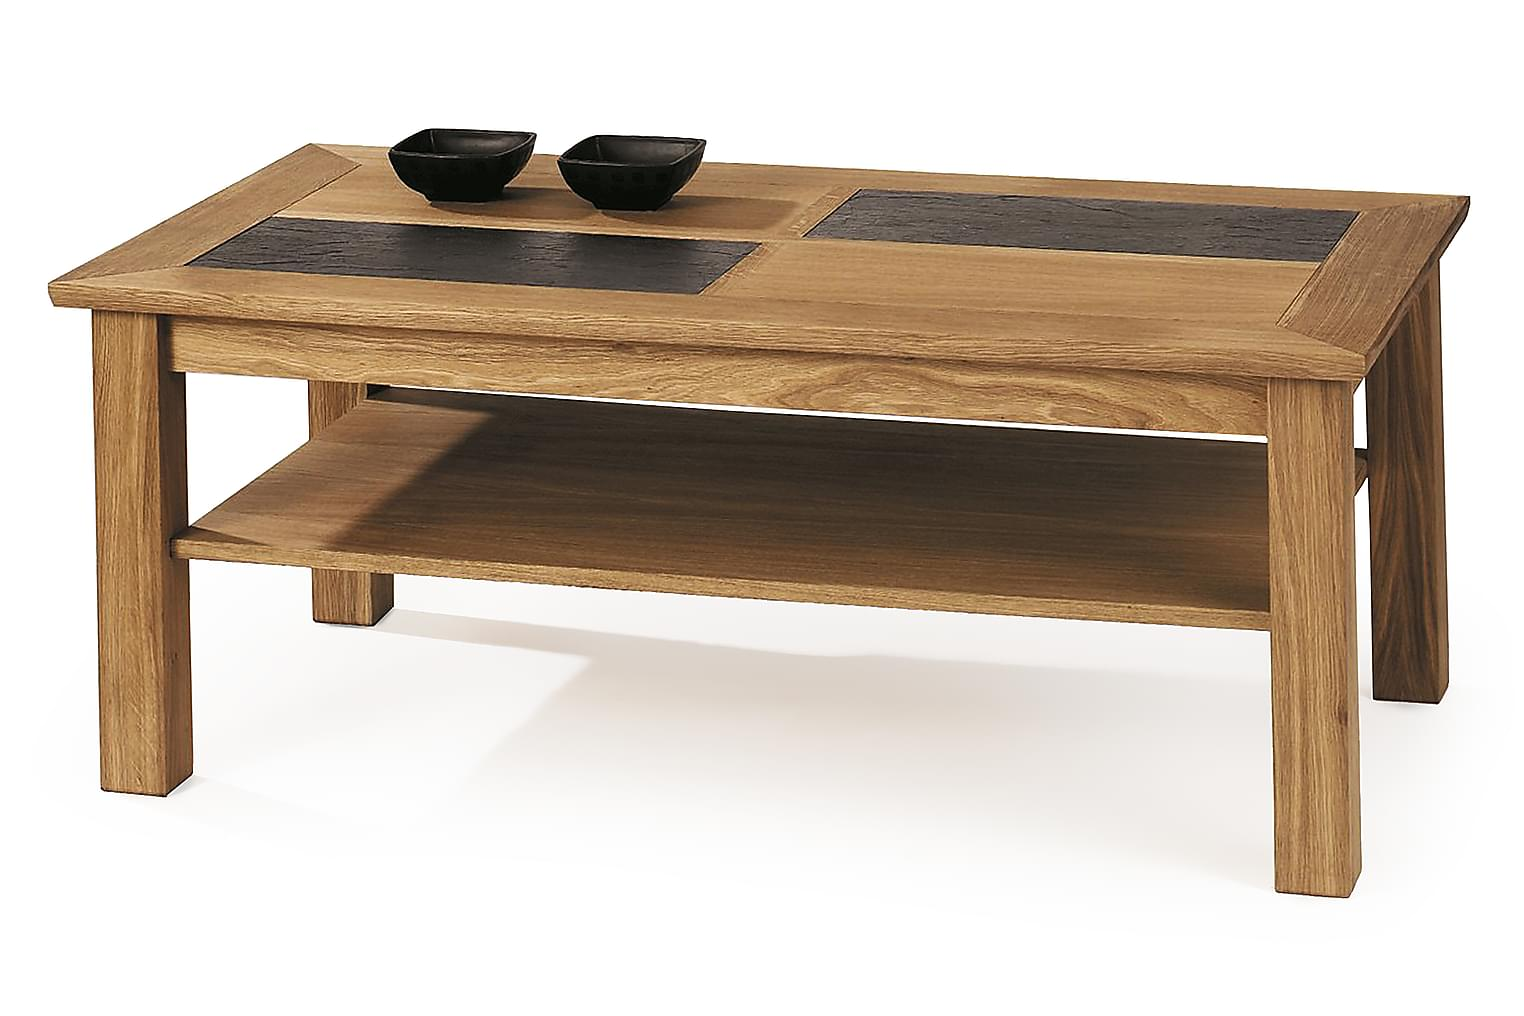 Scandinavian Choice Lomma Sofabord 130 cm - Oljet Eik/Fin?r